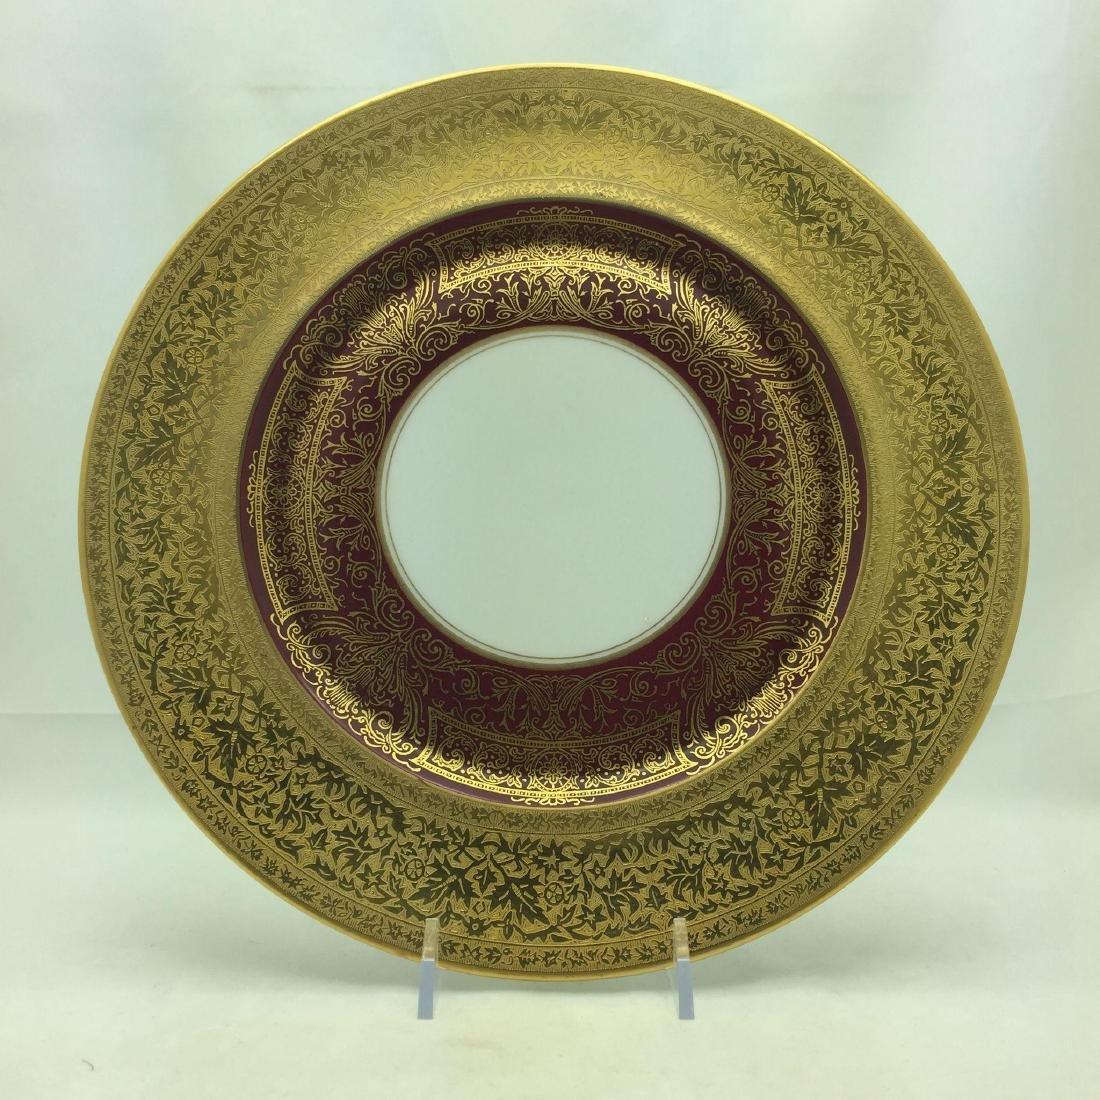 12 Heinrich Burgundy + Gold Large Service Plates - 3